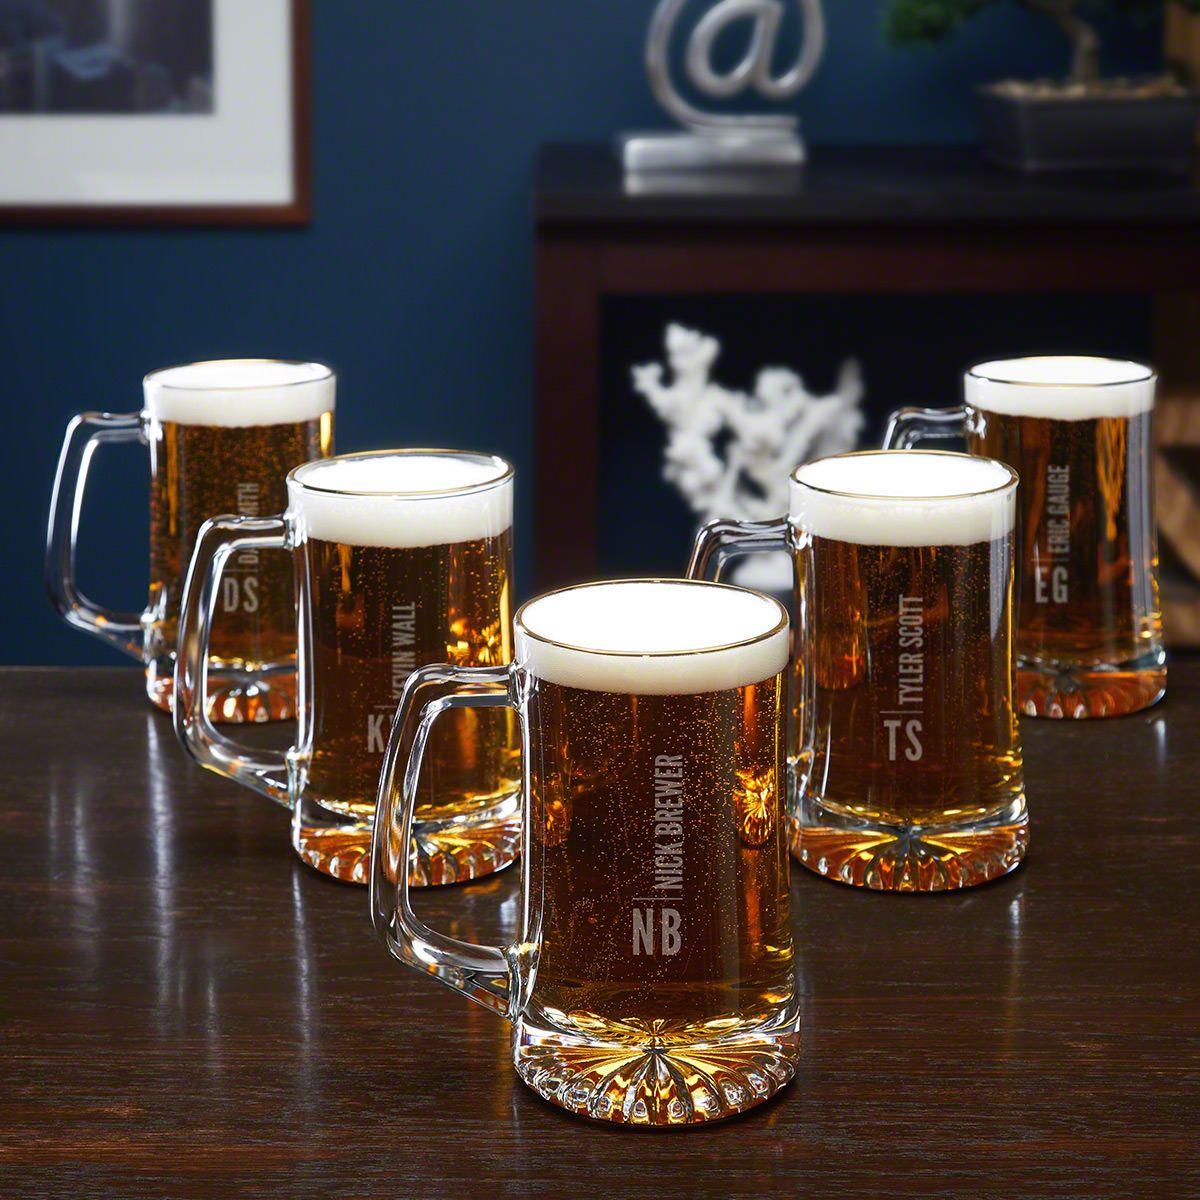 Calvin Custom Gold Rim Beer Mugs for Groomsmen – Set of 5